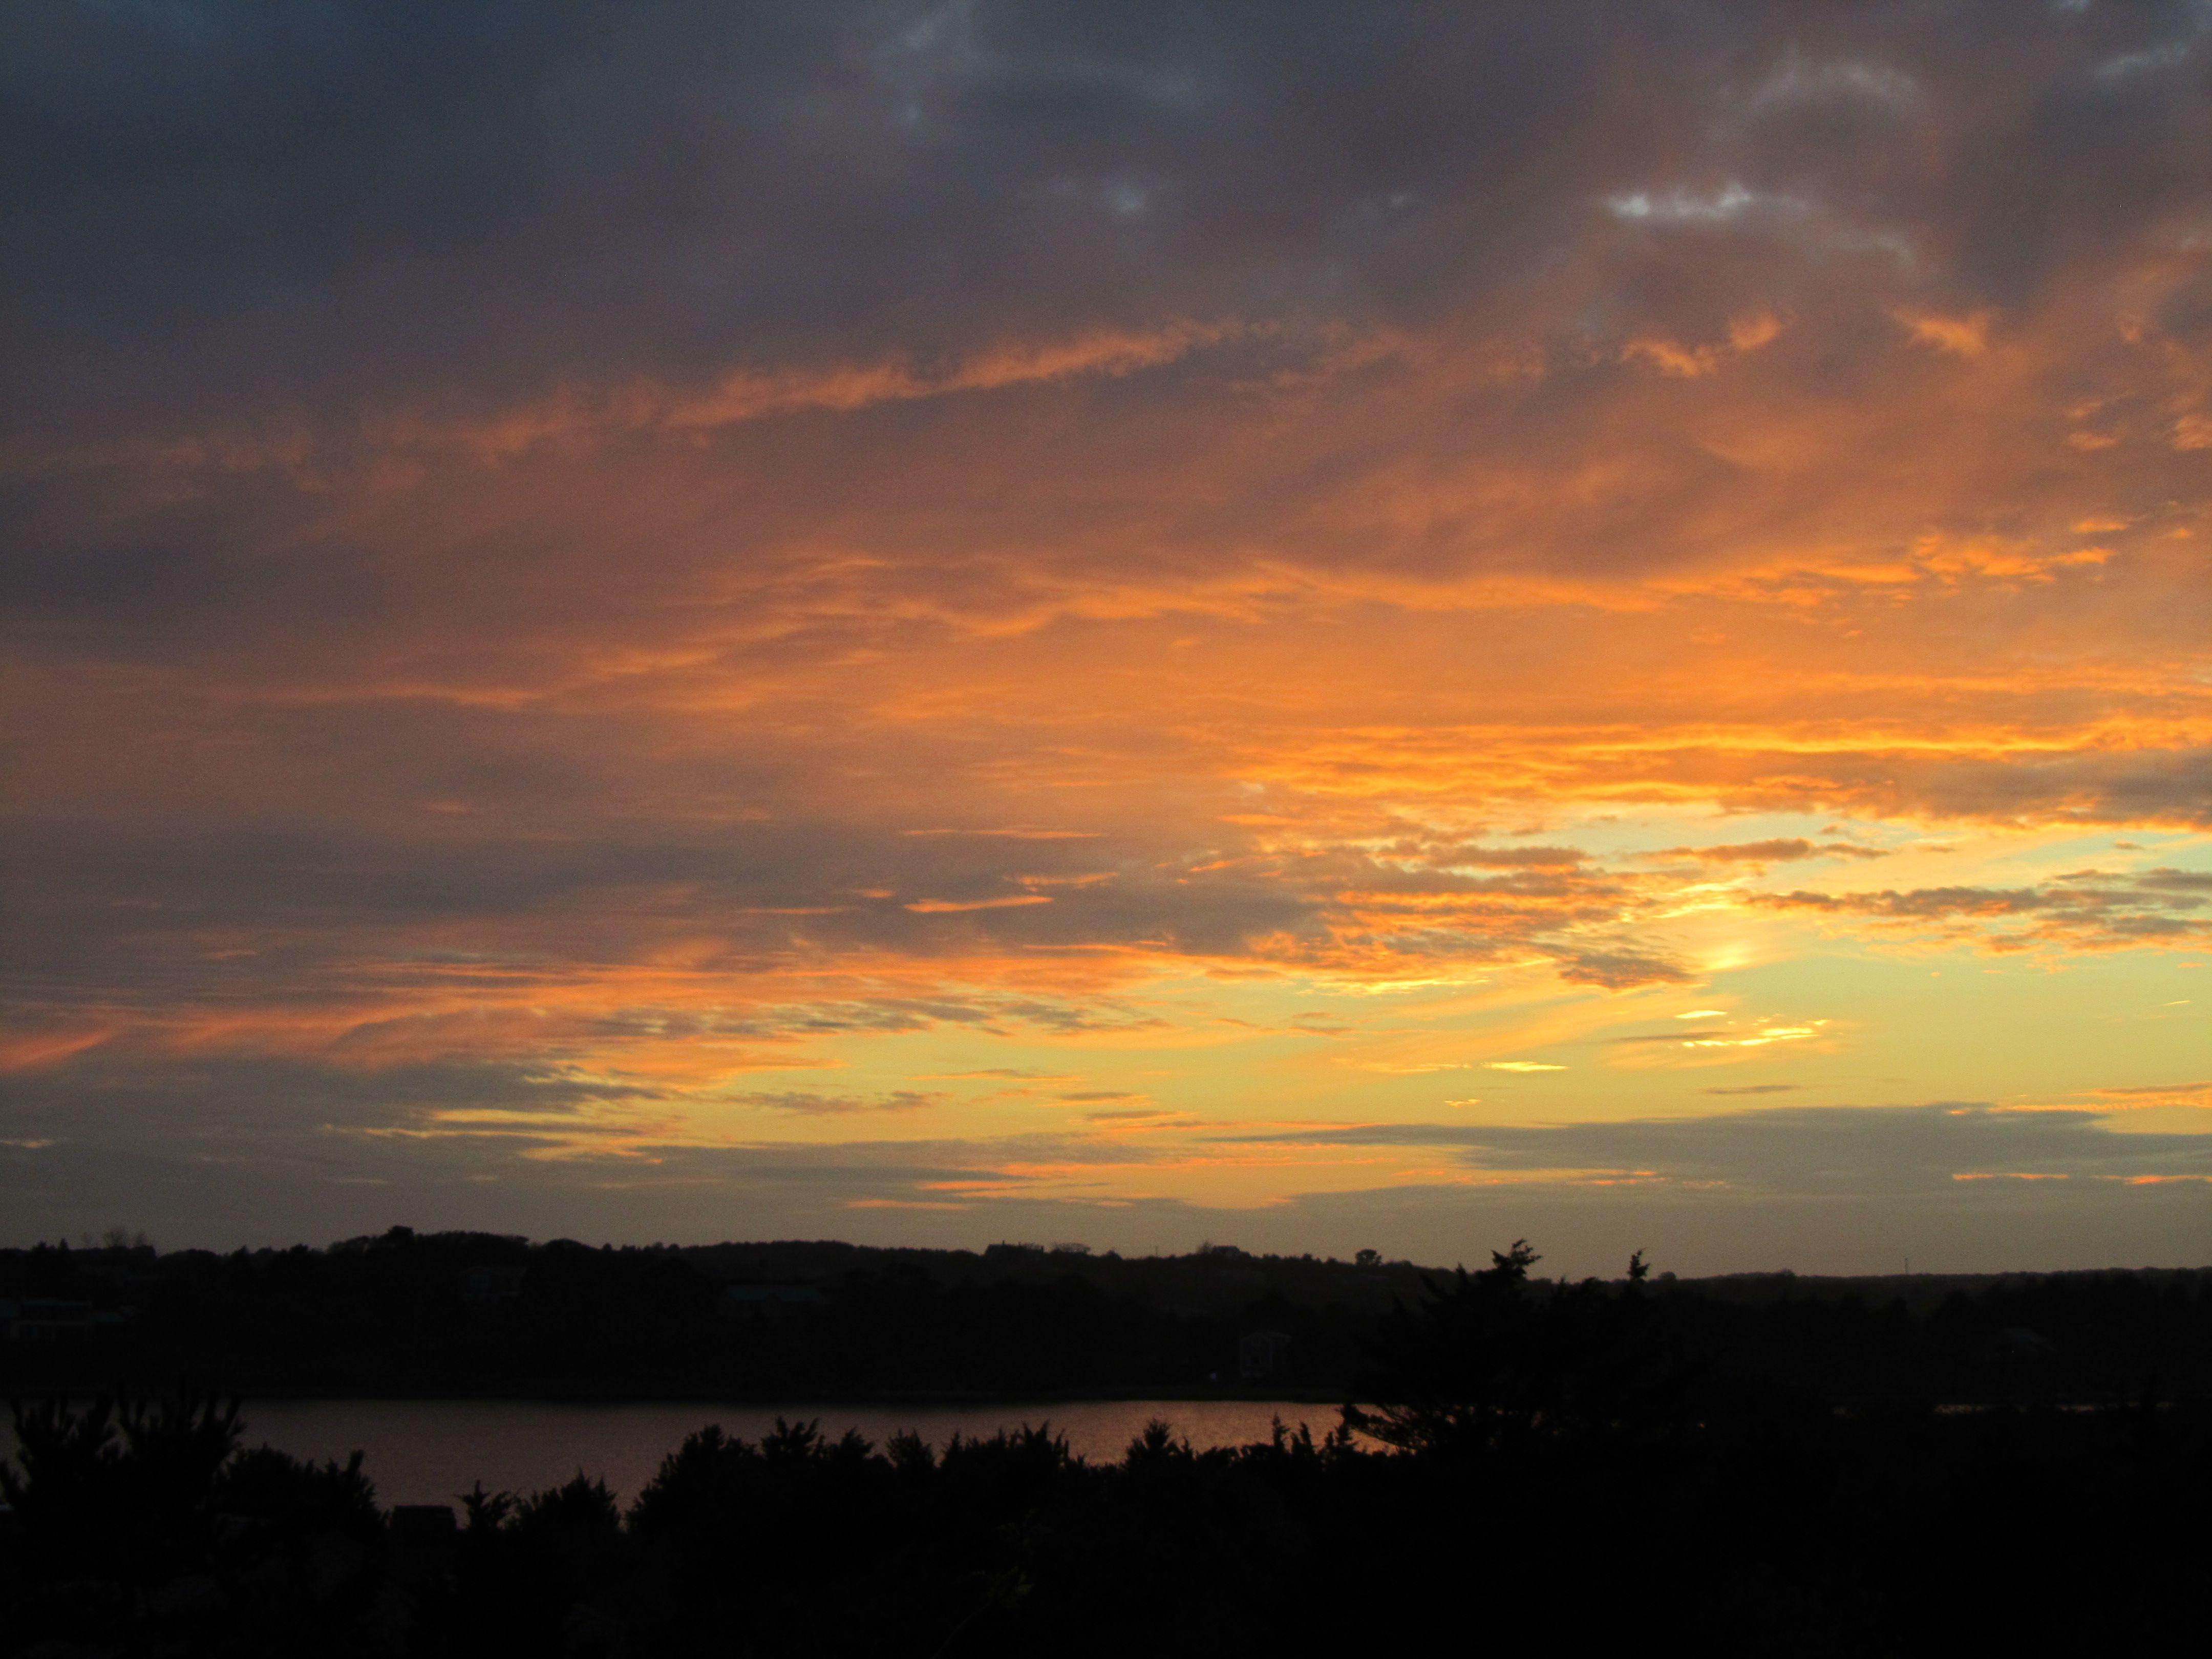 Sunset, Marthas Vineyard